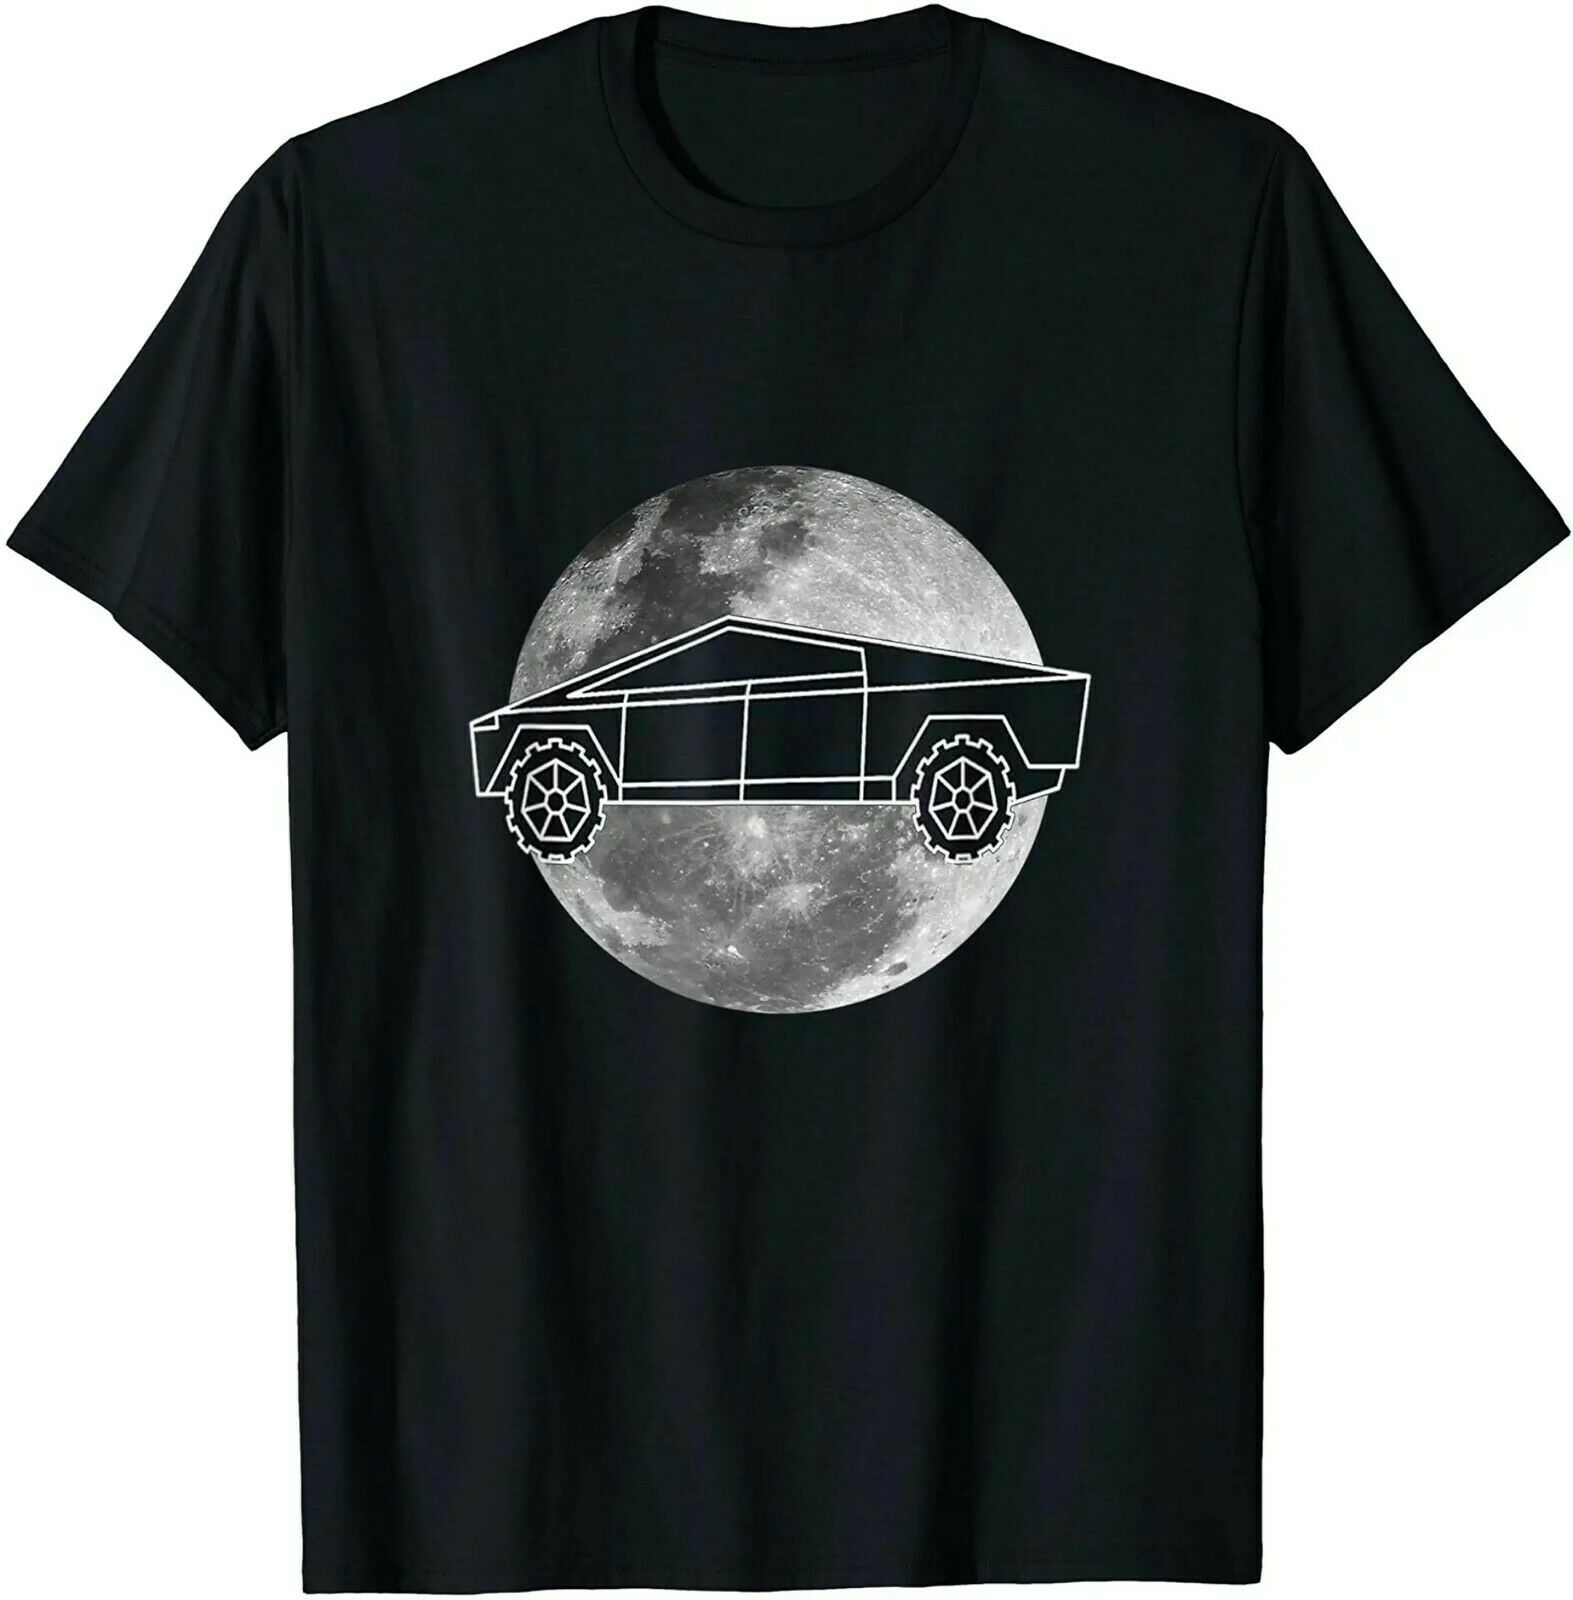 Cybertruck Cyber camión Graffiti Future estetic camiseta de tamaño completo